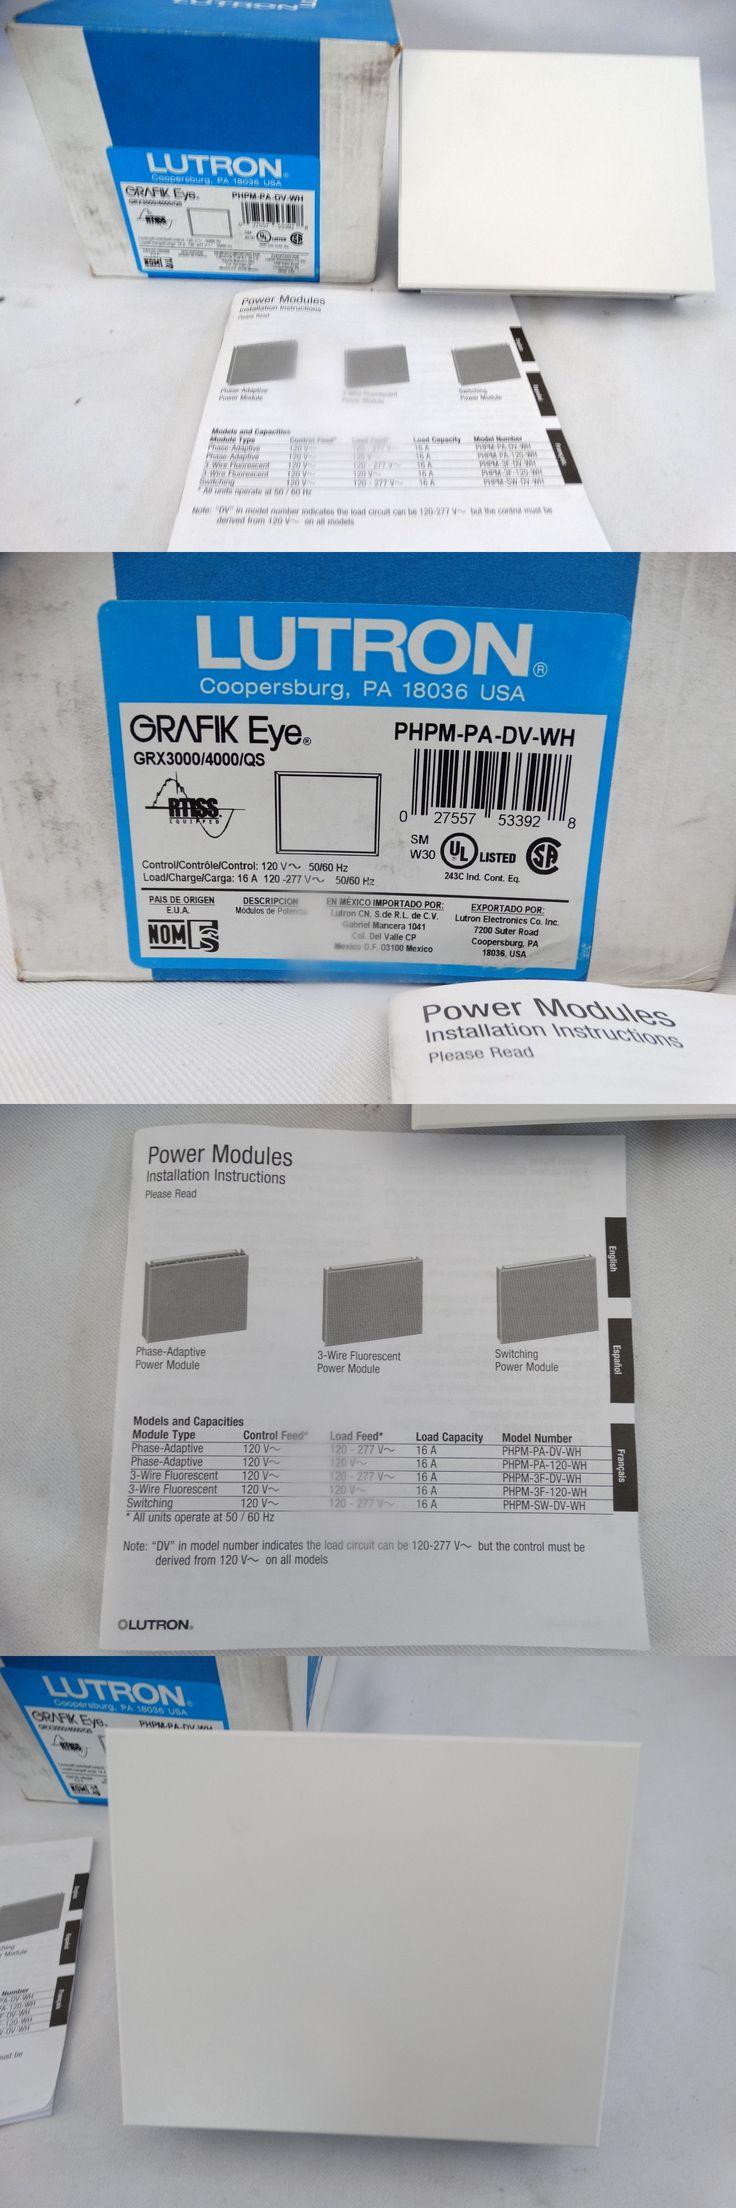 Home Automation Modules: Lutron Grafik Eye Grx3000 4000 Qs Phpm-Pa-Dv-Wh Phase Adaptive Power Module 16A -> BUY IT NOW ONLY: $89.99 on eBay!